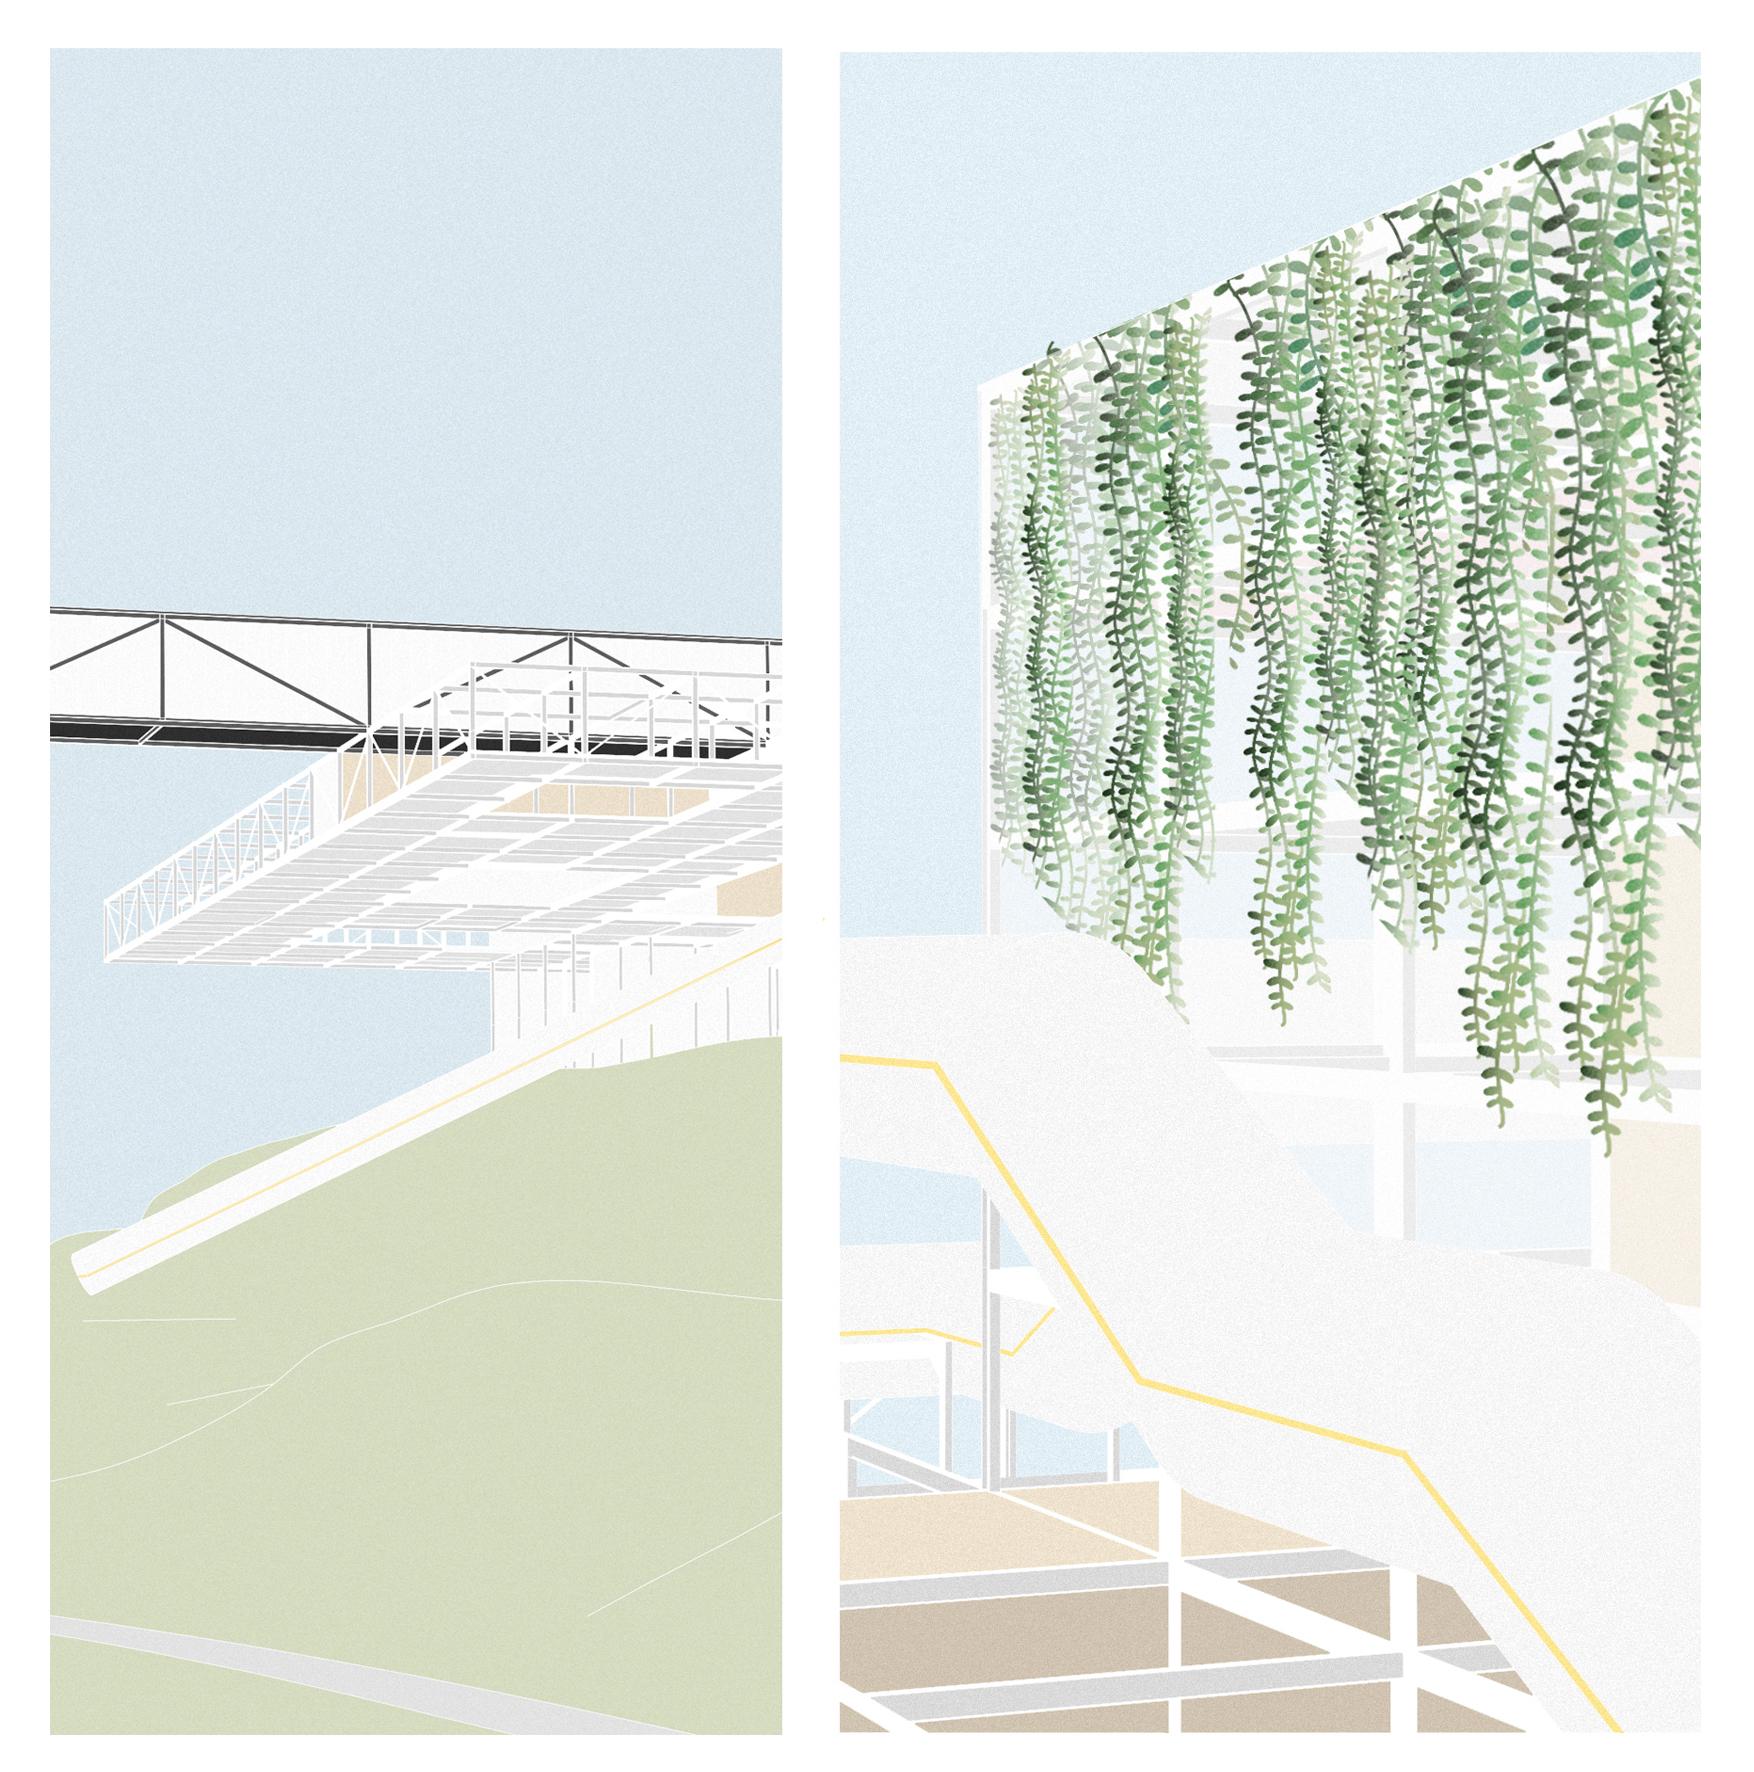 Eco Experience / Alper Turan